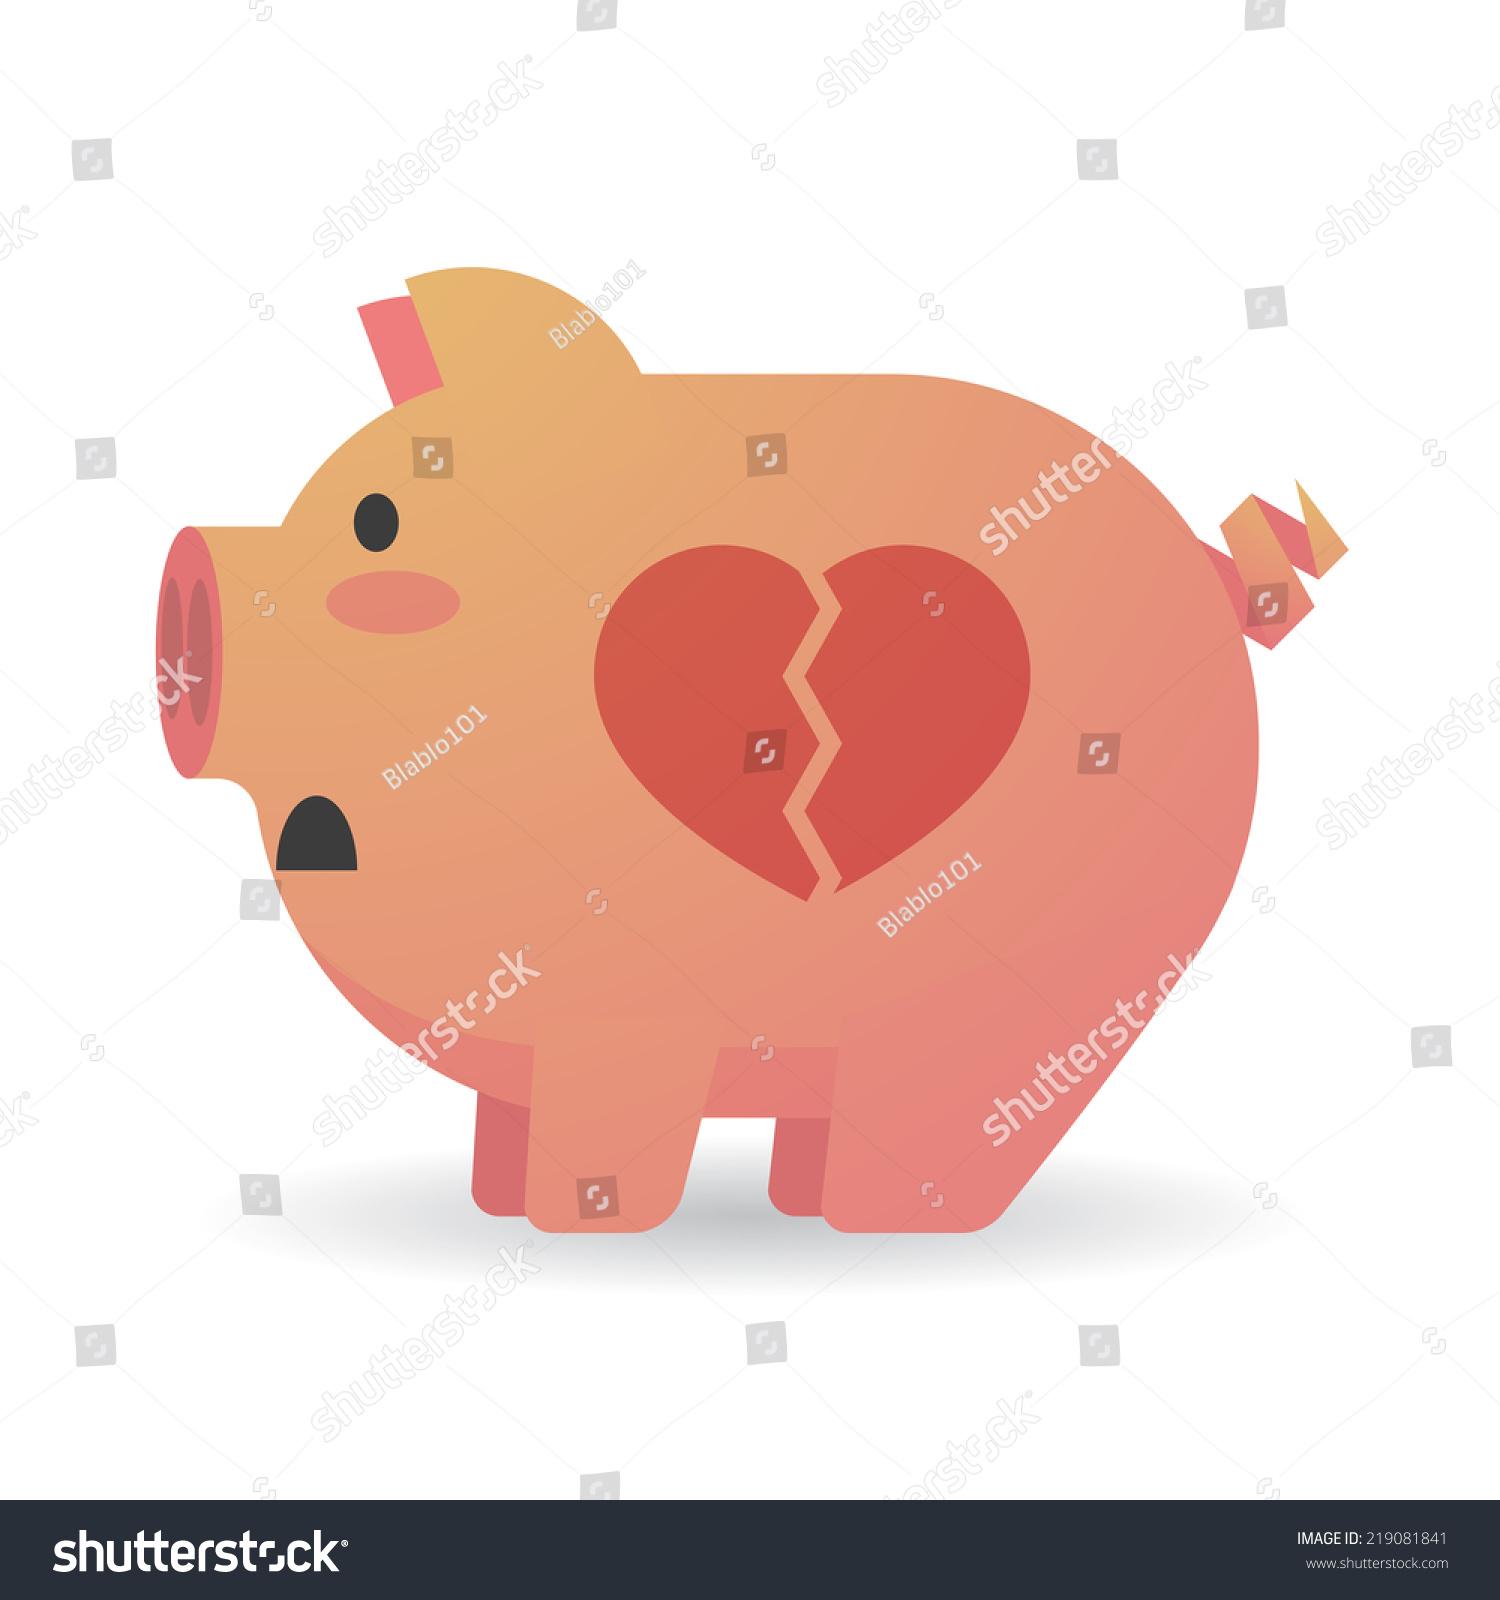 Illustration Isolated Cartoon Pig Heart Stock Vector 219081841 ... for Pig Heart Cartoon  54lyp